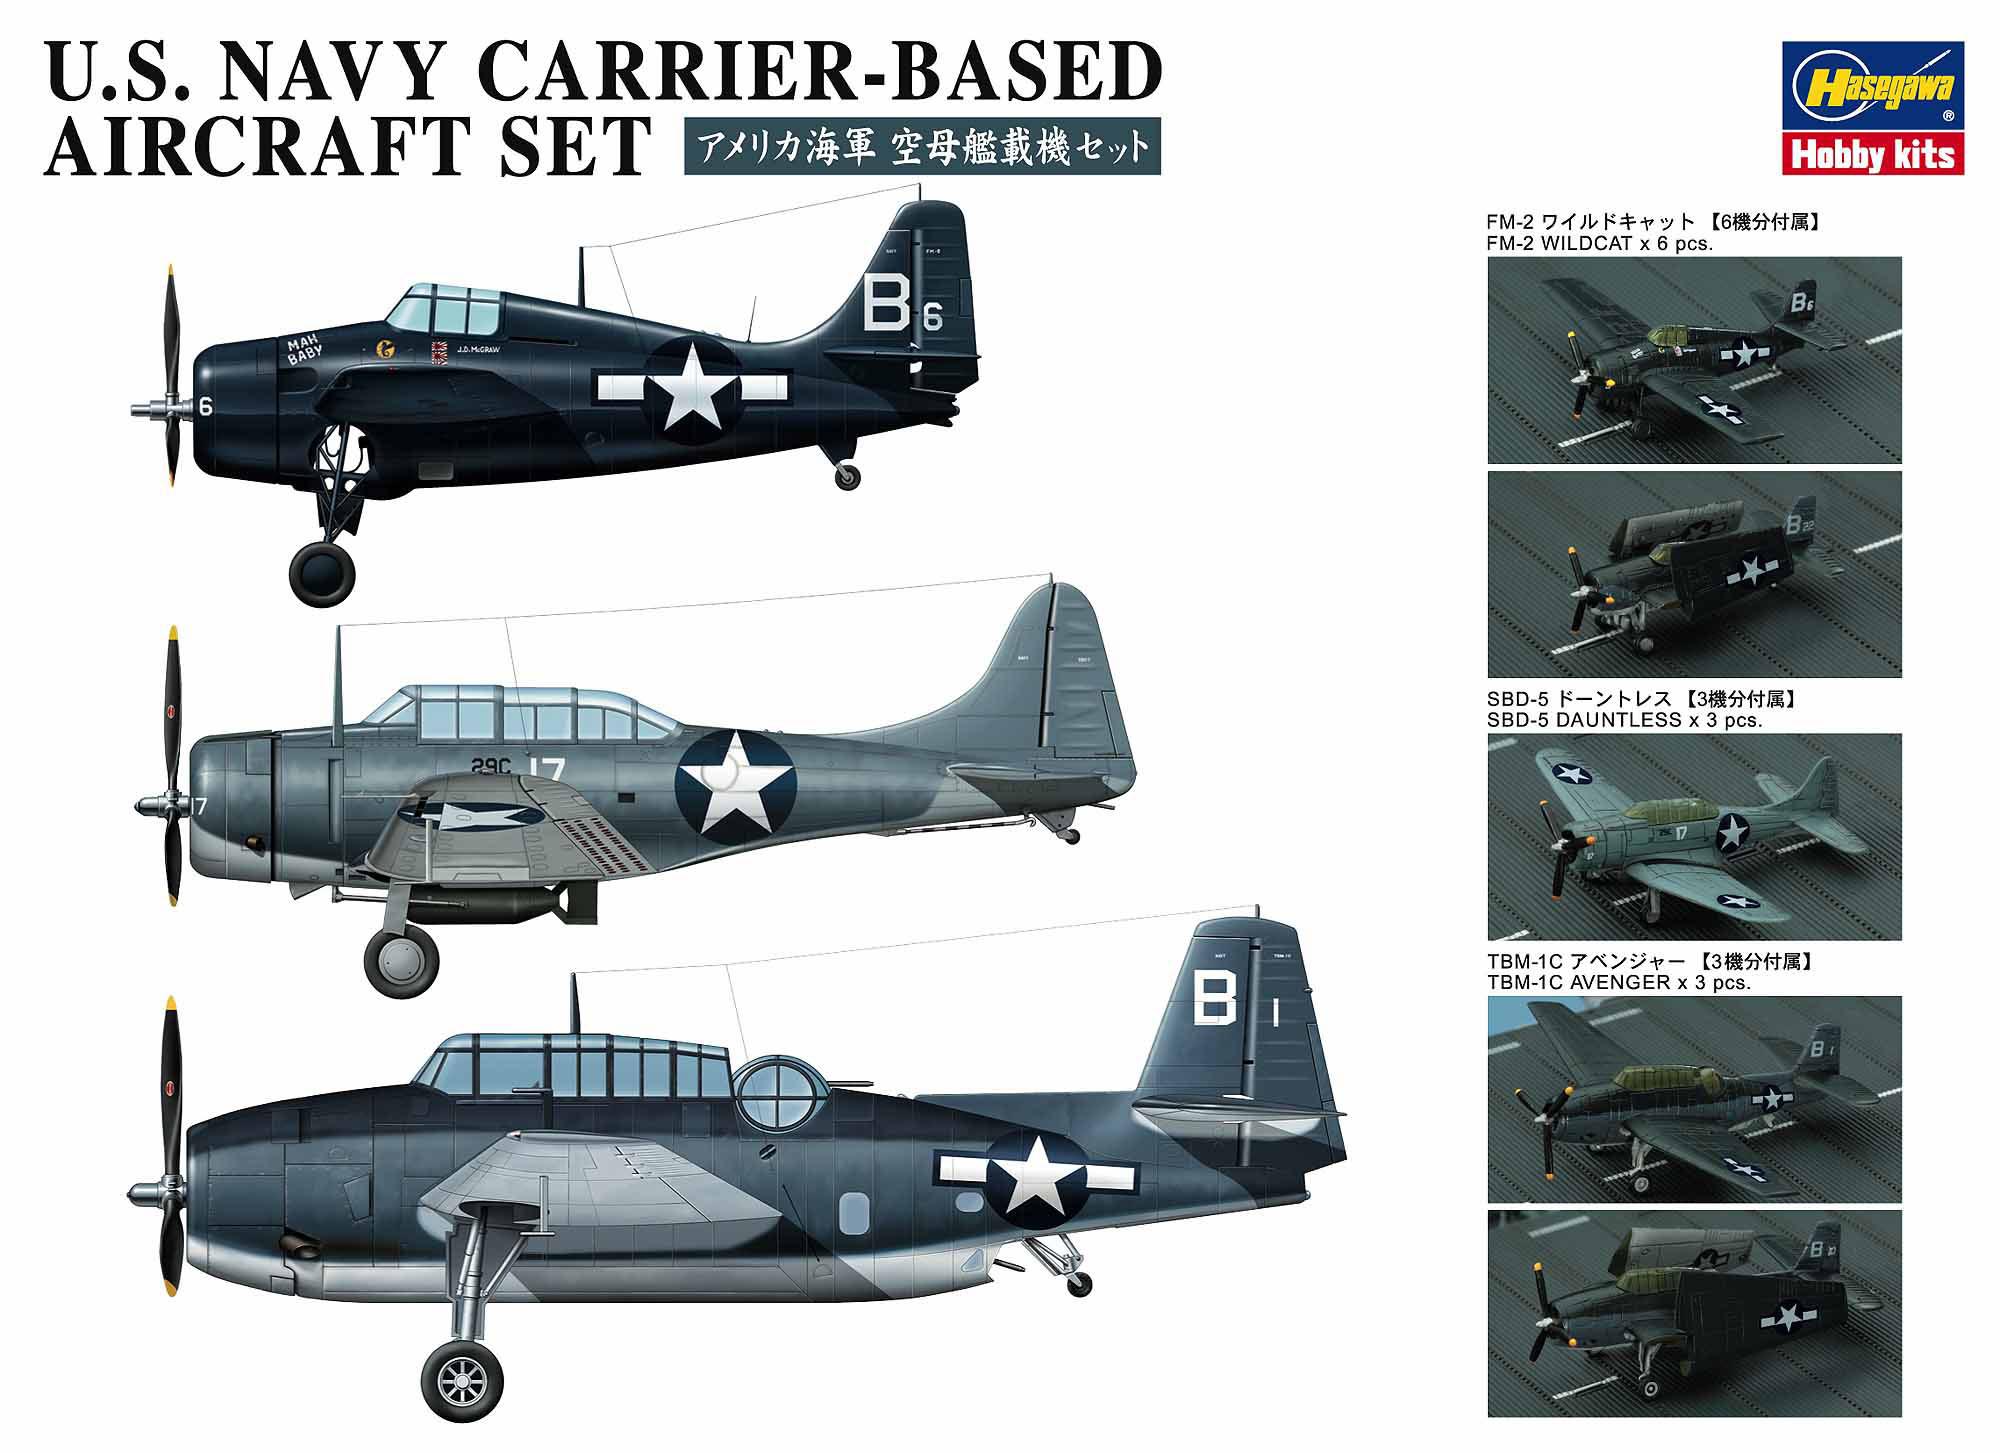 Hasegawa U.S. Navy Carrier-Based Aircraft Set QG47